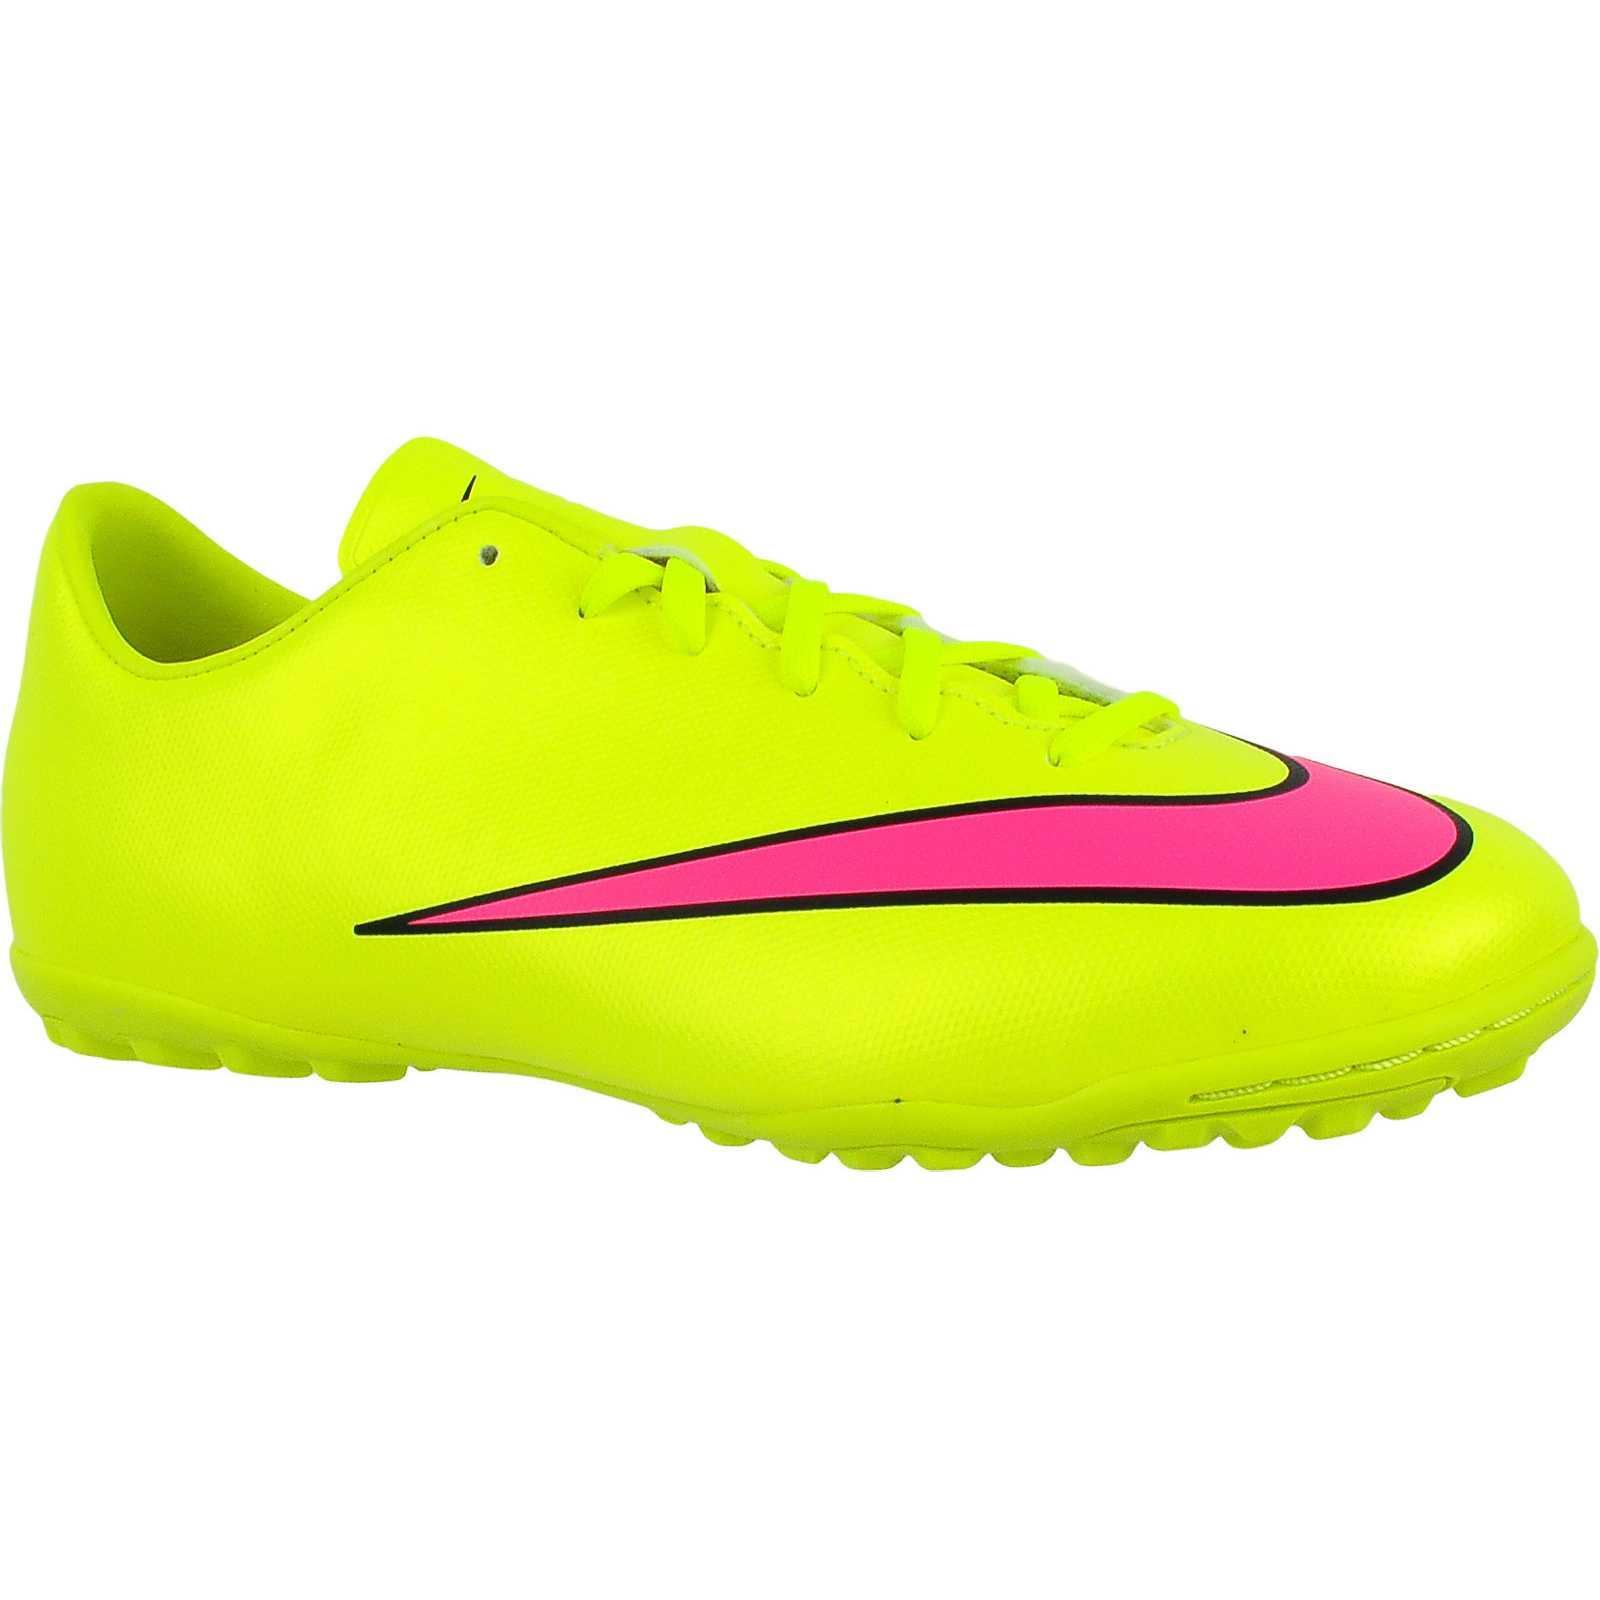 Ghete de fotbal copii Nike Jr Mercurial Victory V TF 651641-760